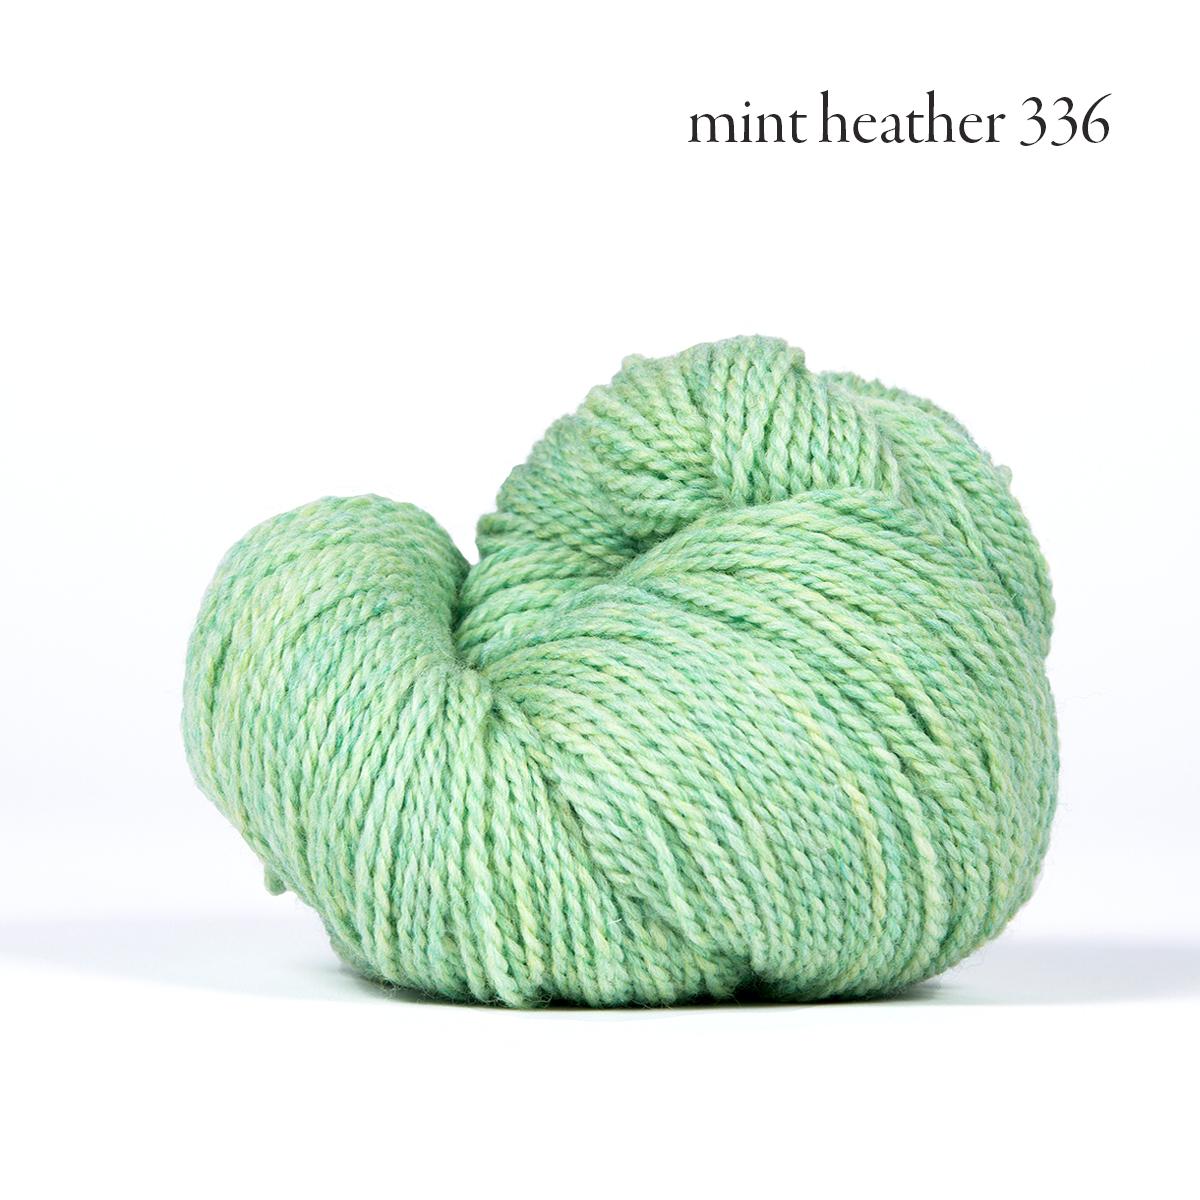 mint heather 336.jpg